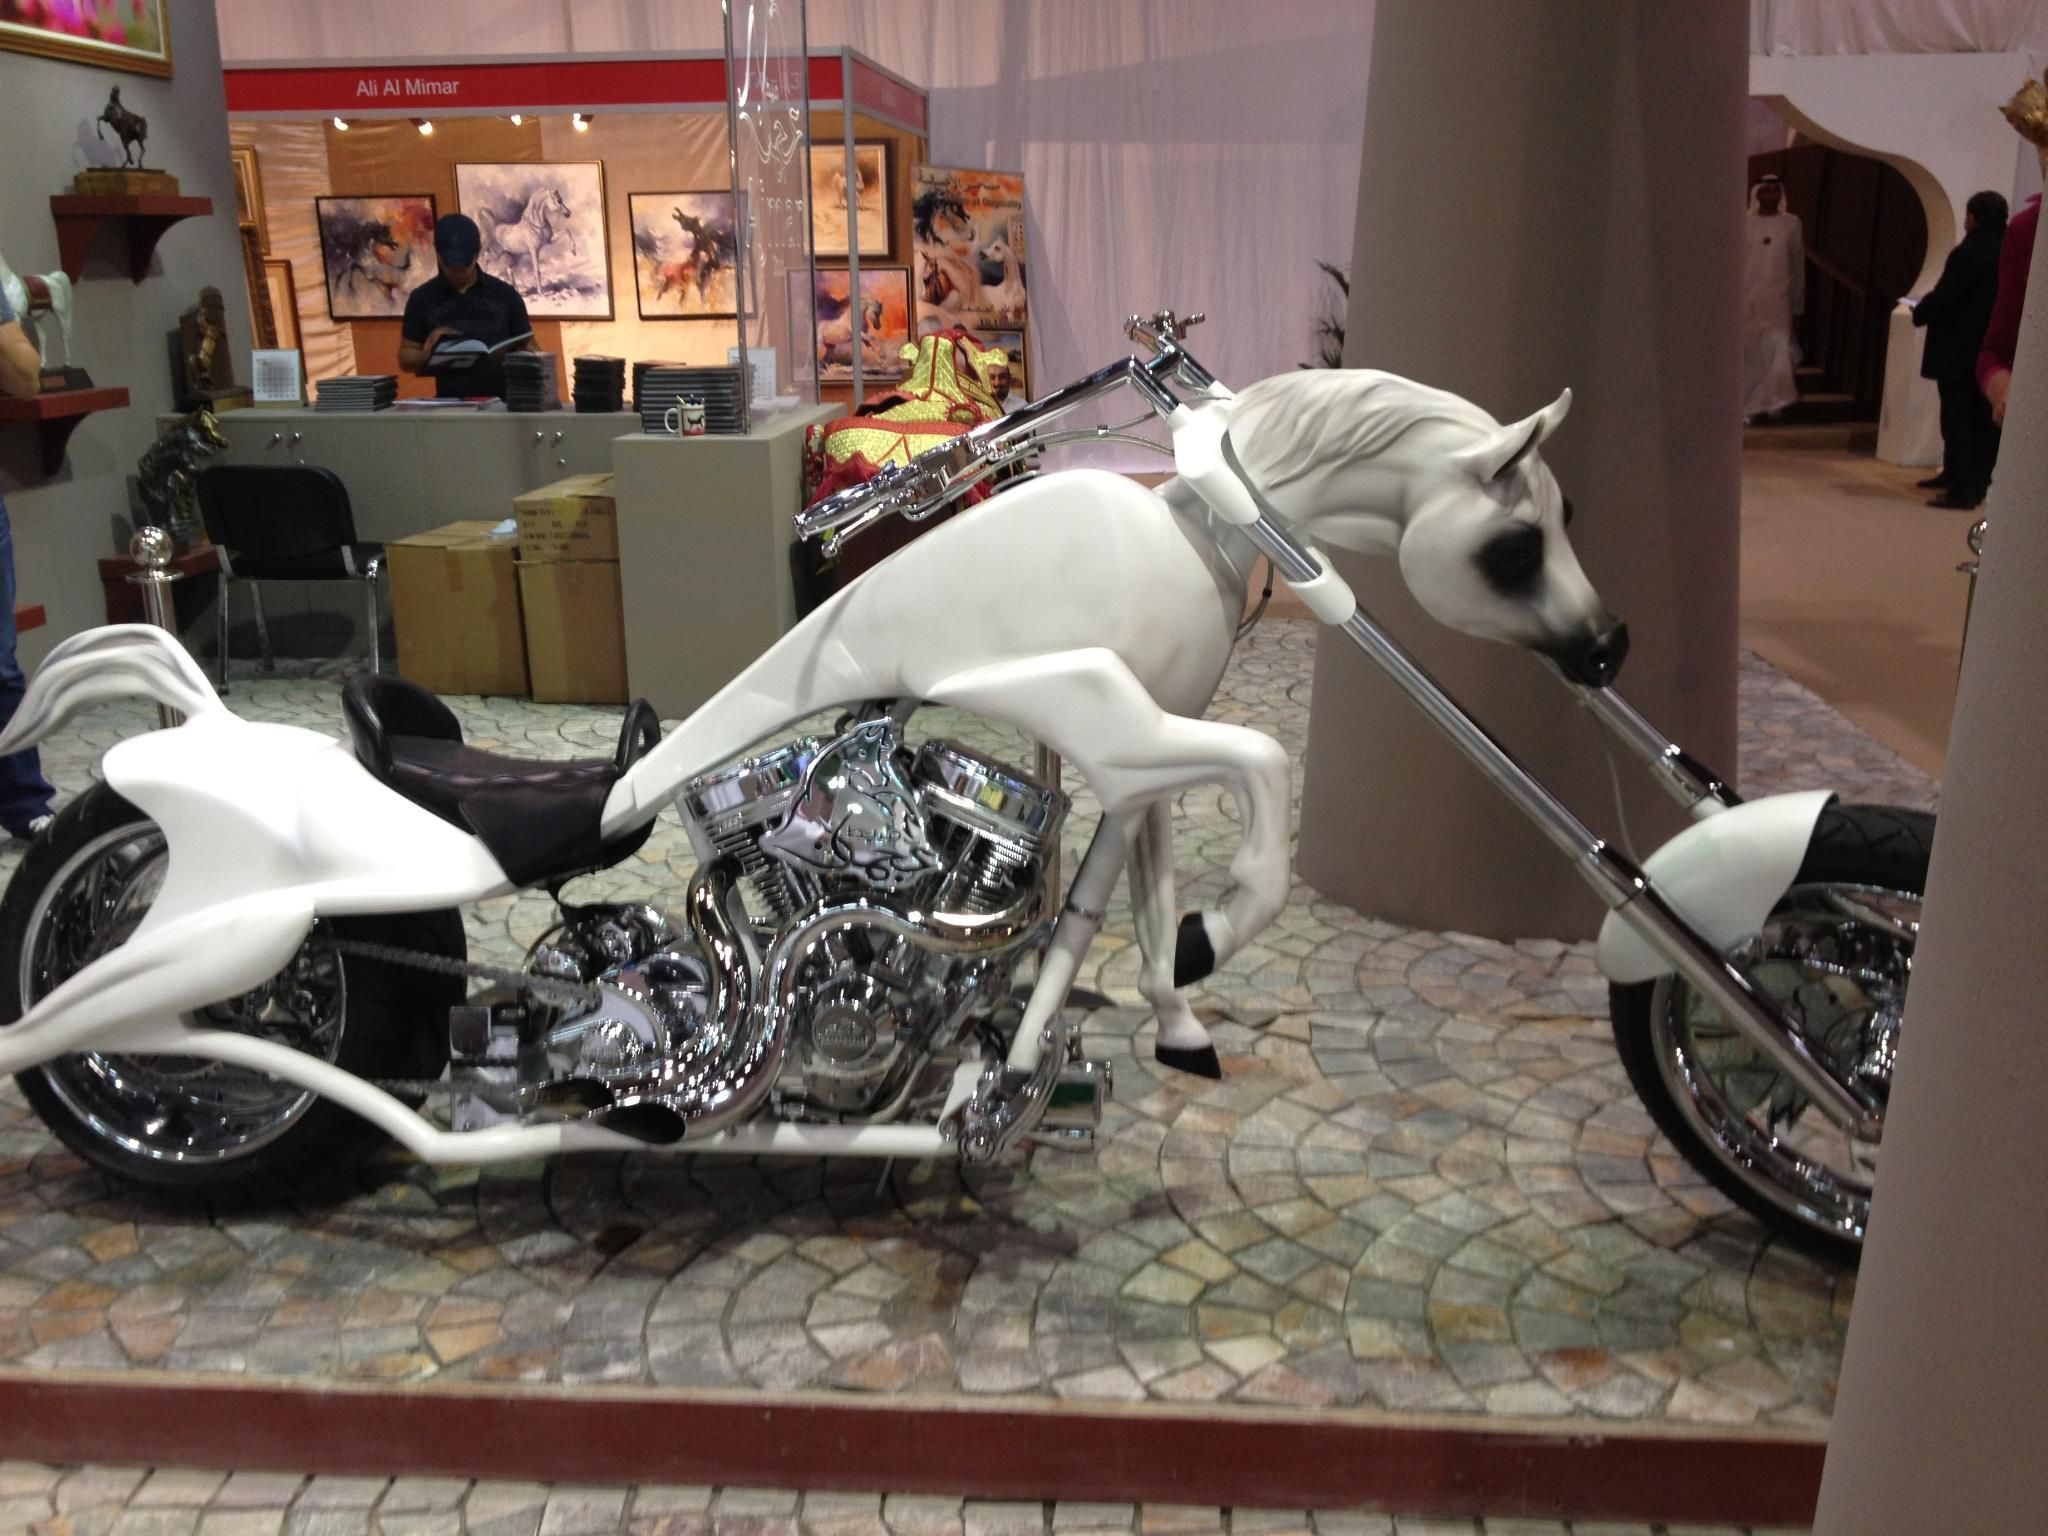 Scott Bailey' Arabian Horse Bike Style Motorcycle Cars Motorcycles Vehicles